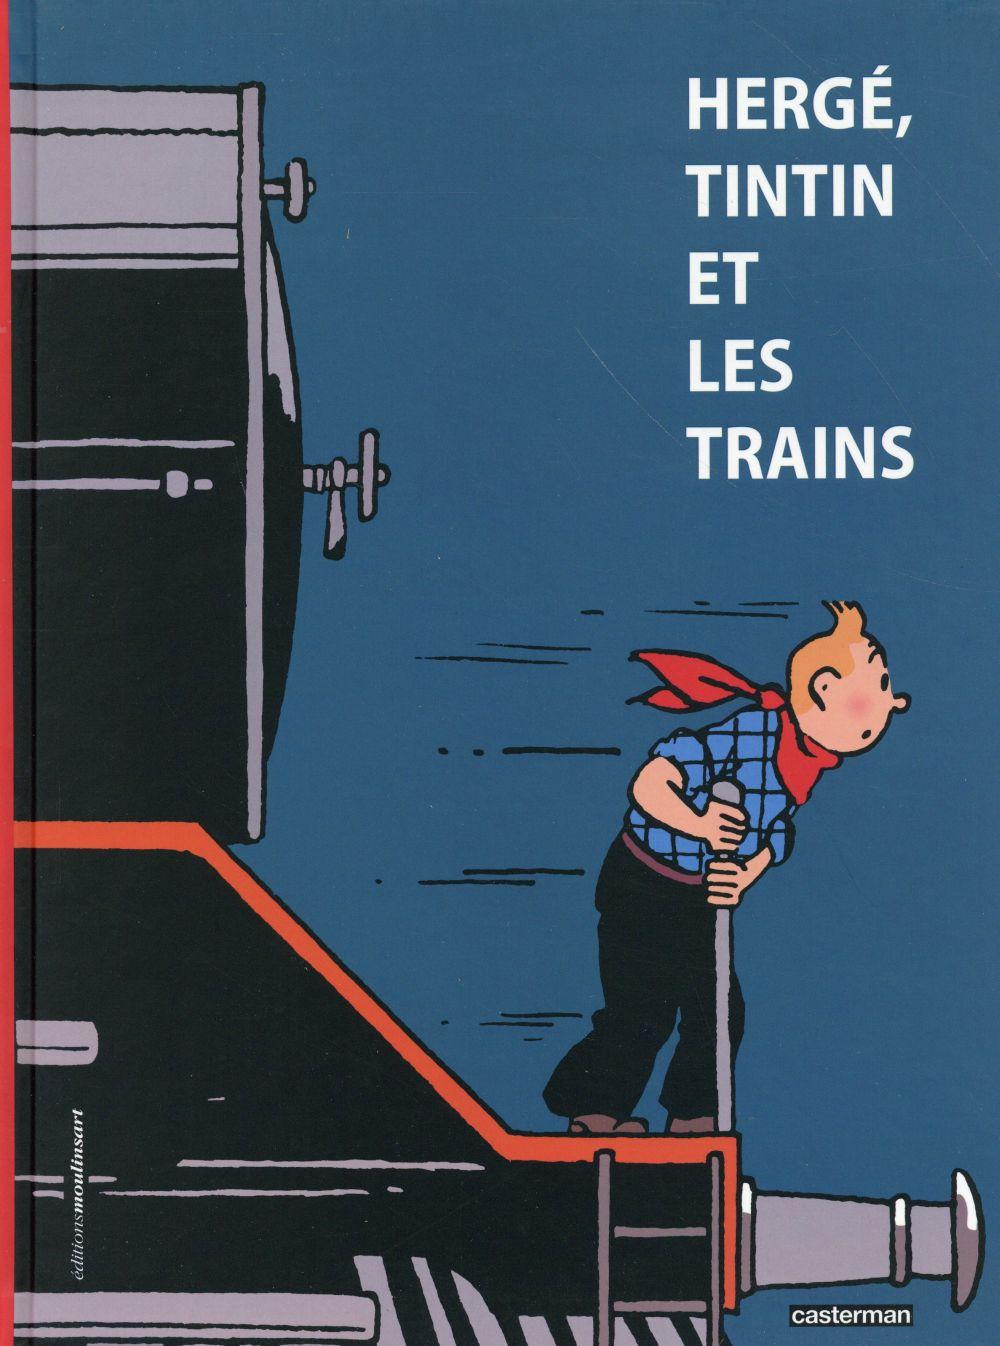 HERGE, TINTIN ET LES TRAINS Verley Benoit Casterman